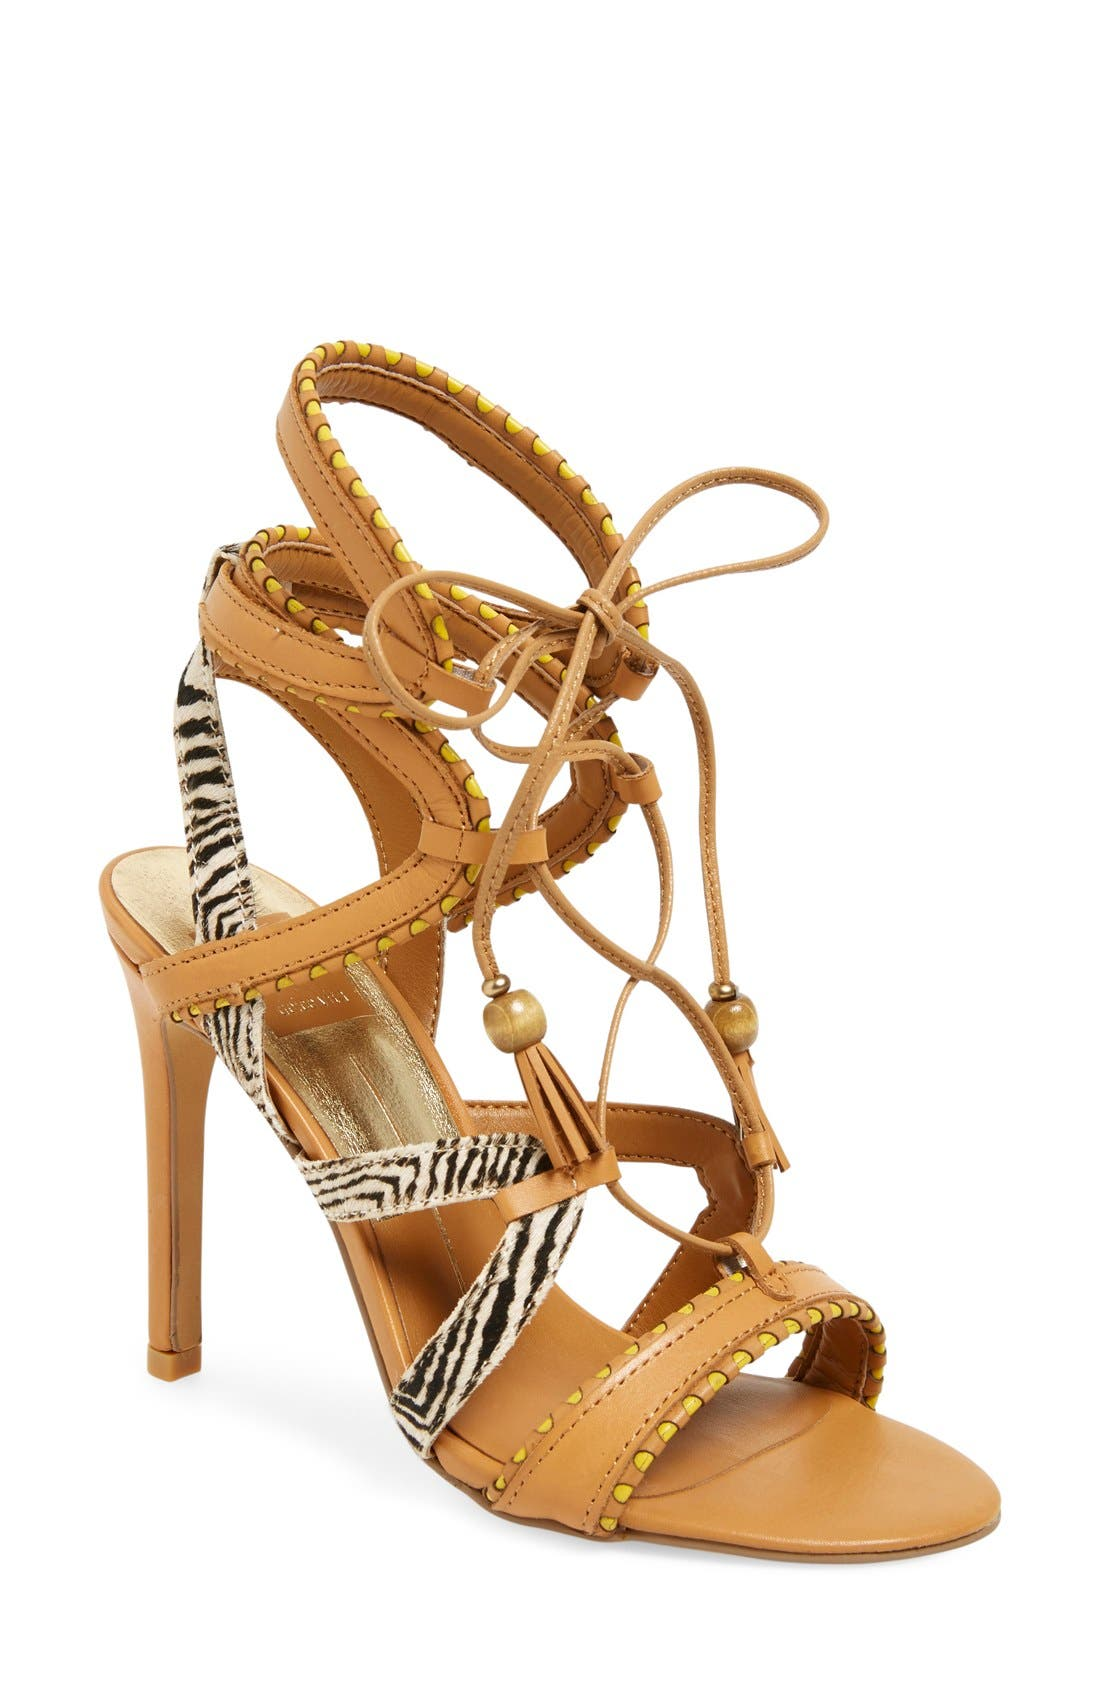 Main Image - Dolce Vita 'Haven' Lace-Up Sandal (Women)